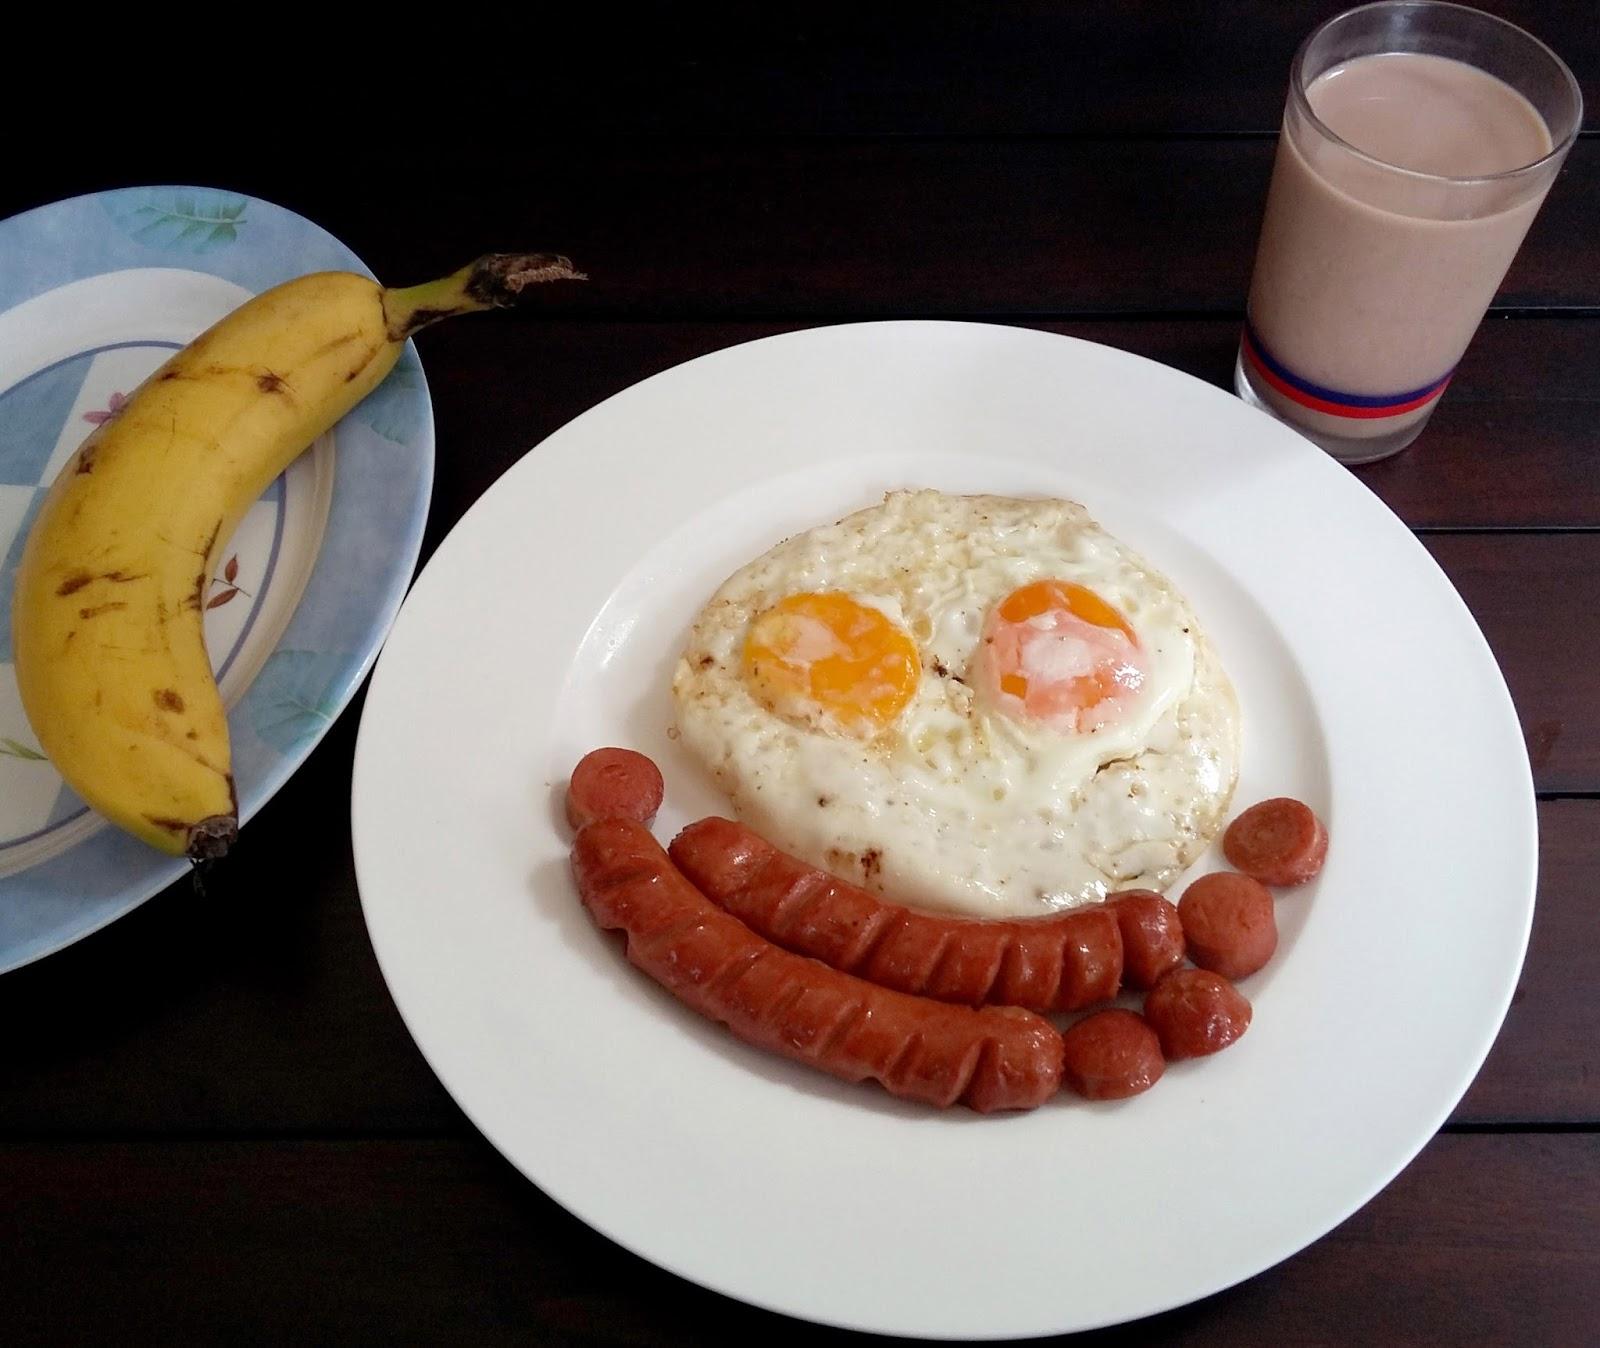 Resep Overnight Oats, Sarapan Diet yang Mudah